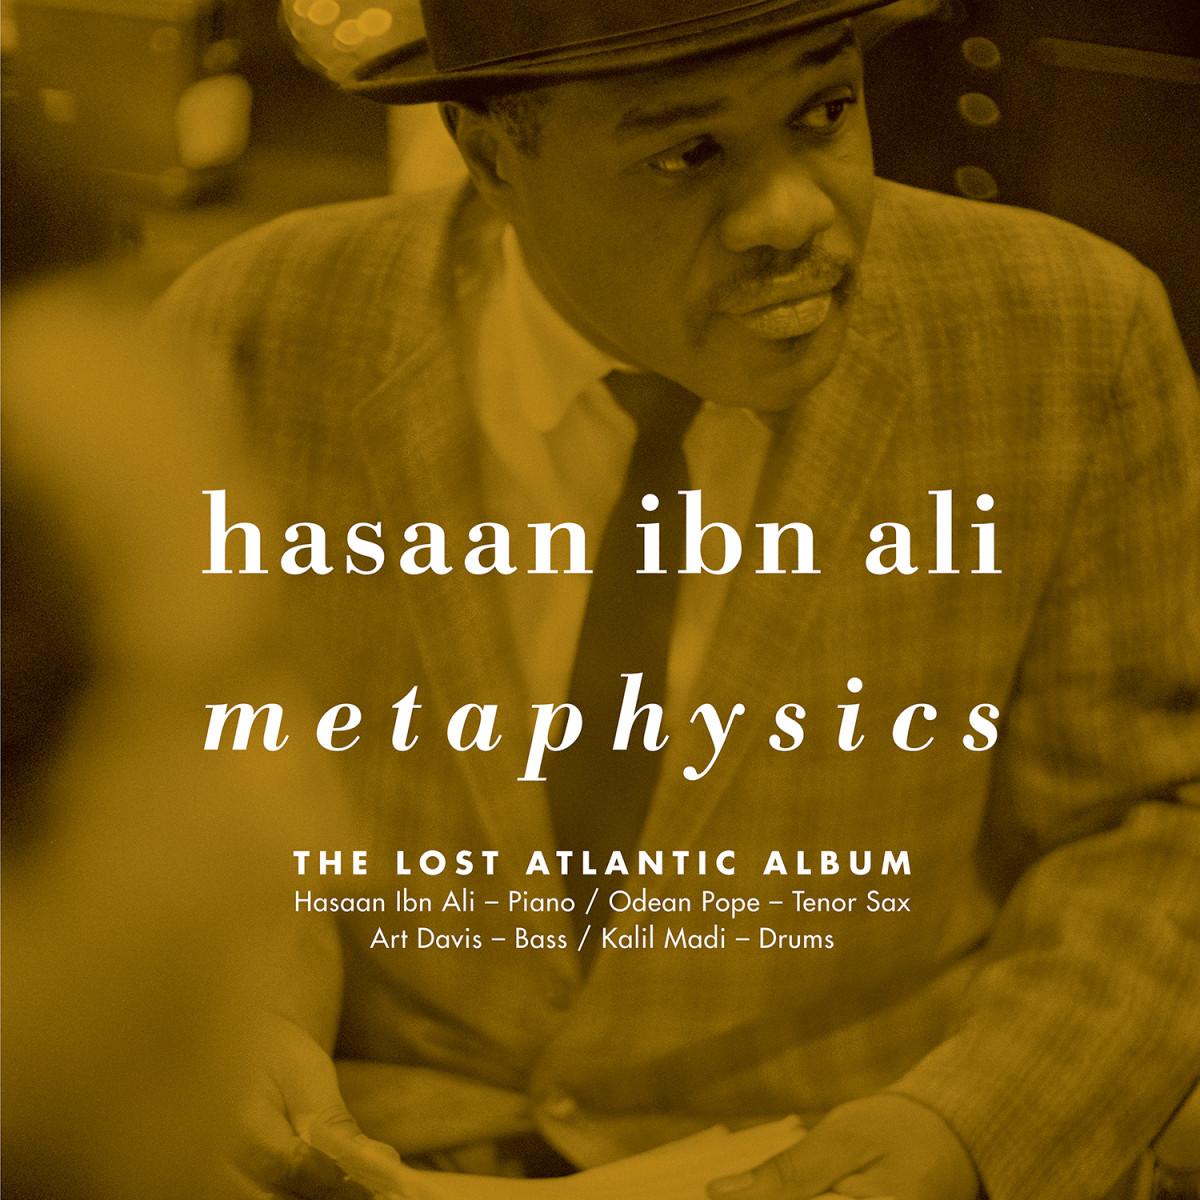 Ali-Hasaan-Ibn-Metaphysics-OV-411